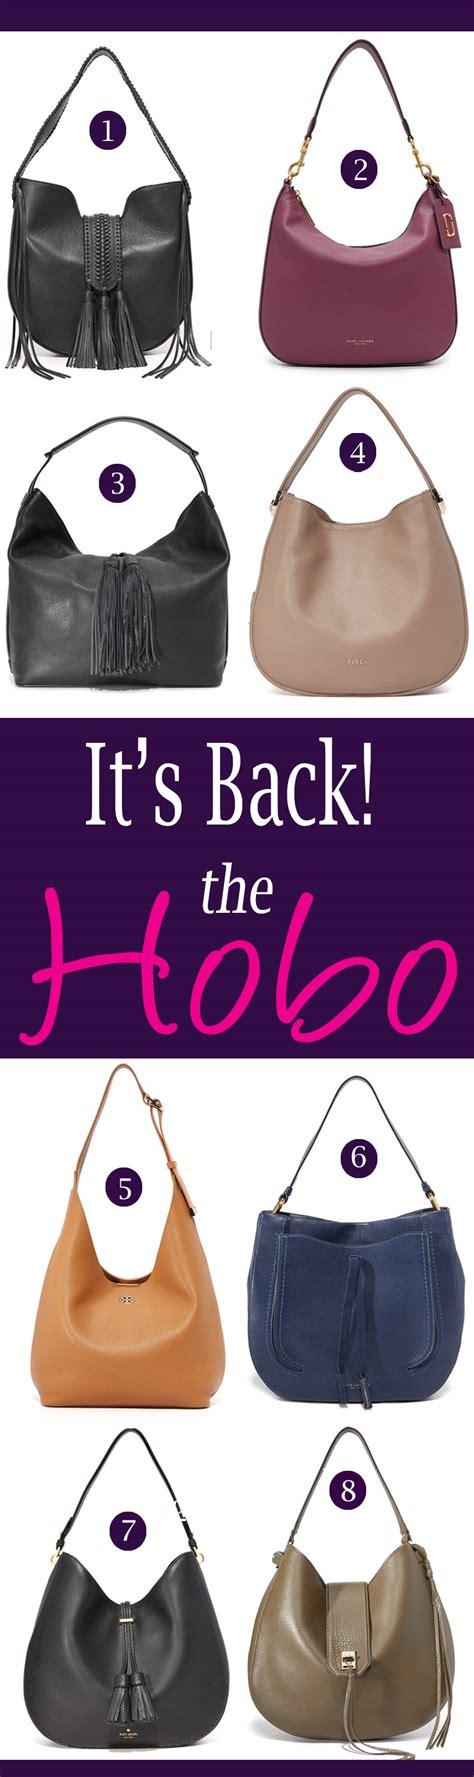 Shopbop Me Back by Hobo Bags Shopbop